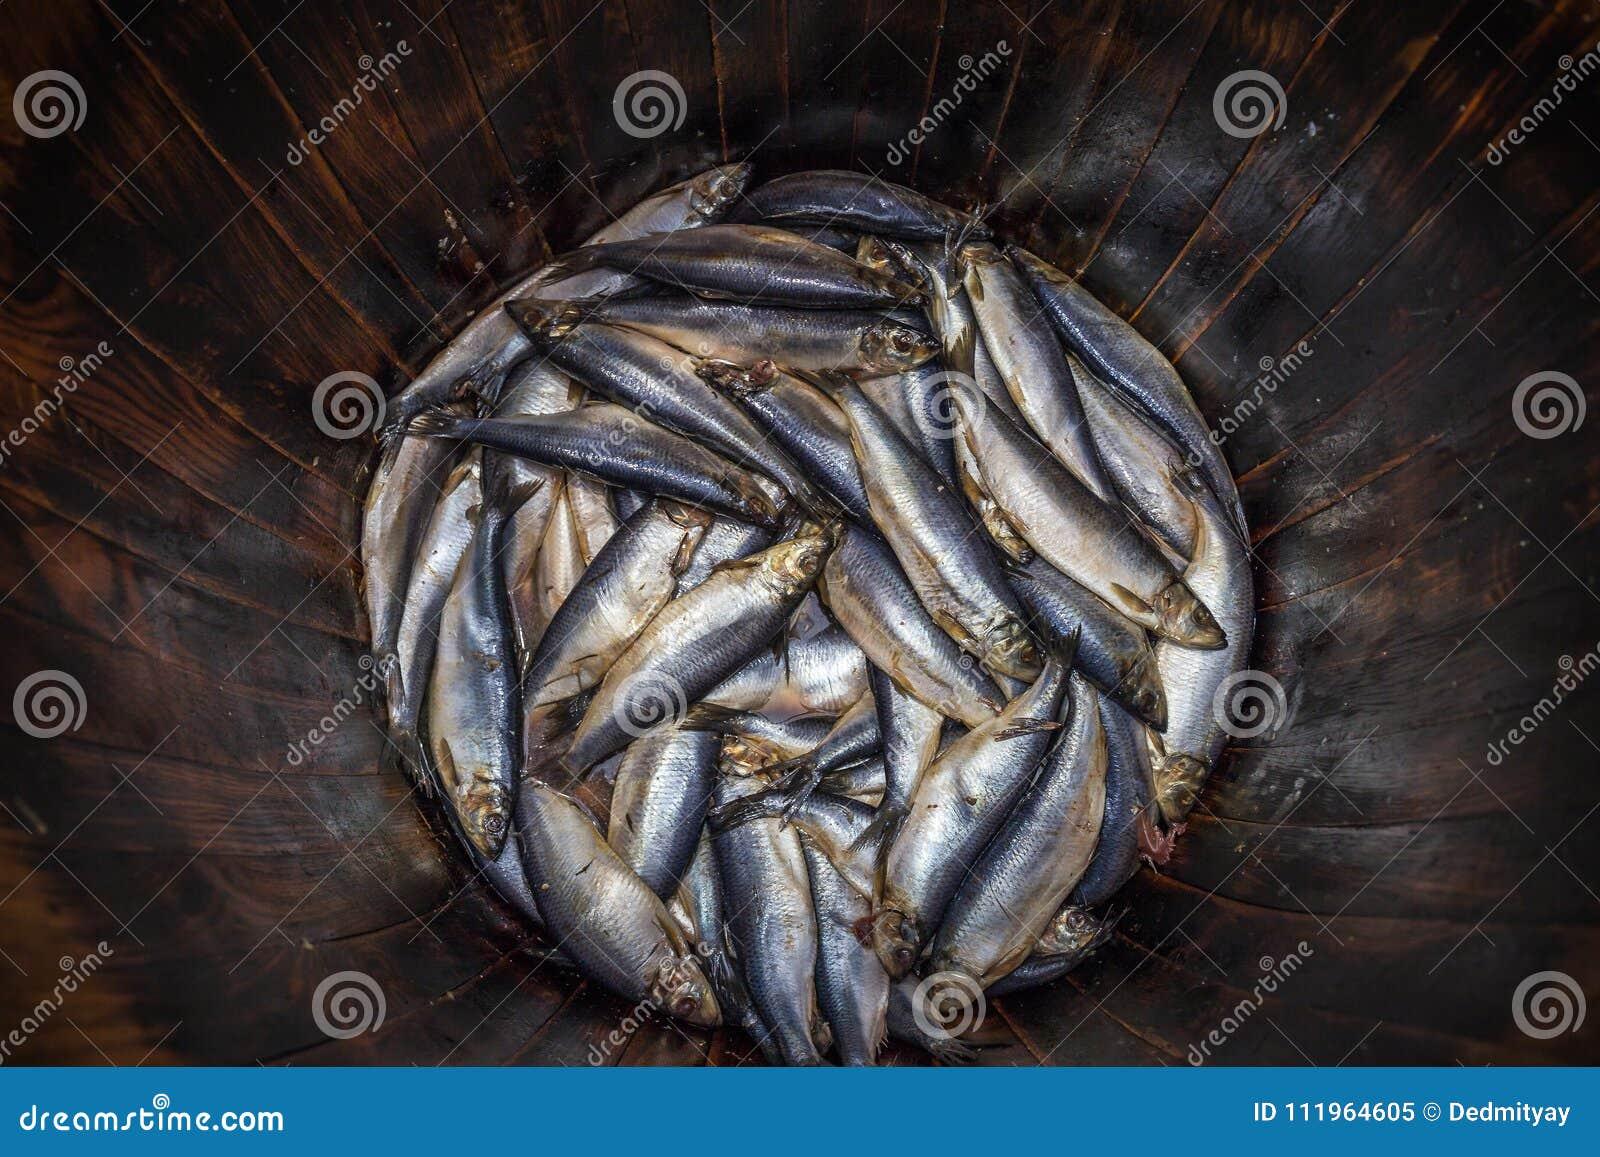 Los arenques frescos salados pescan en el barril de madera del roble, mariscos tradicionales